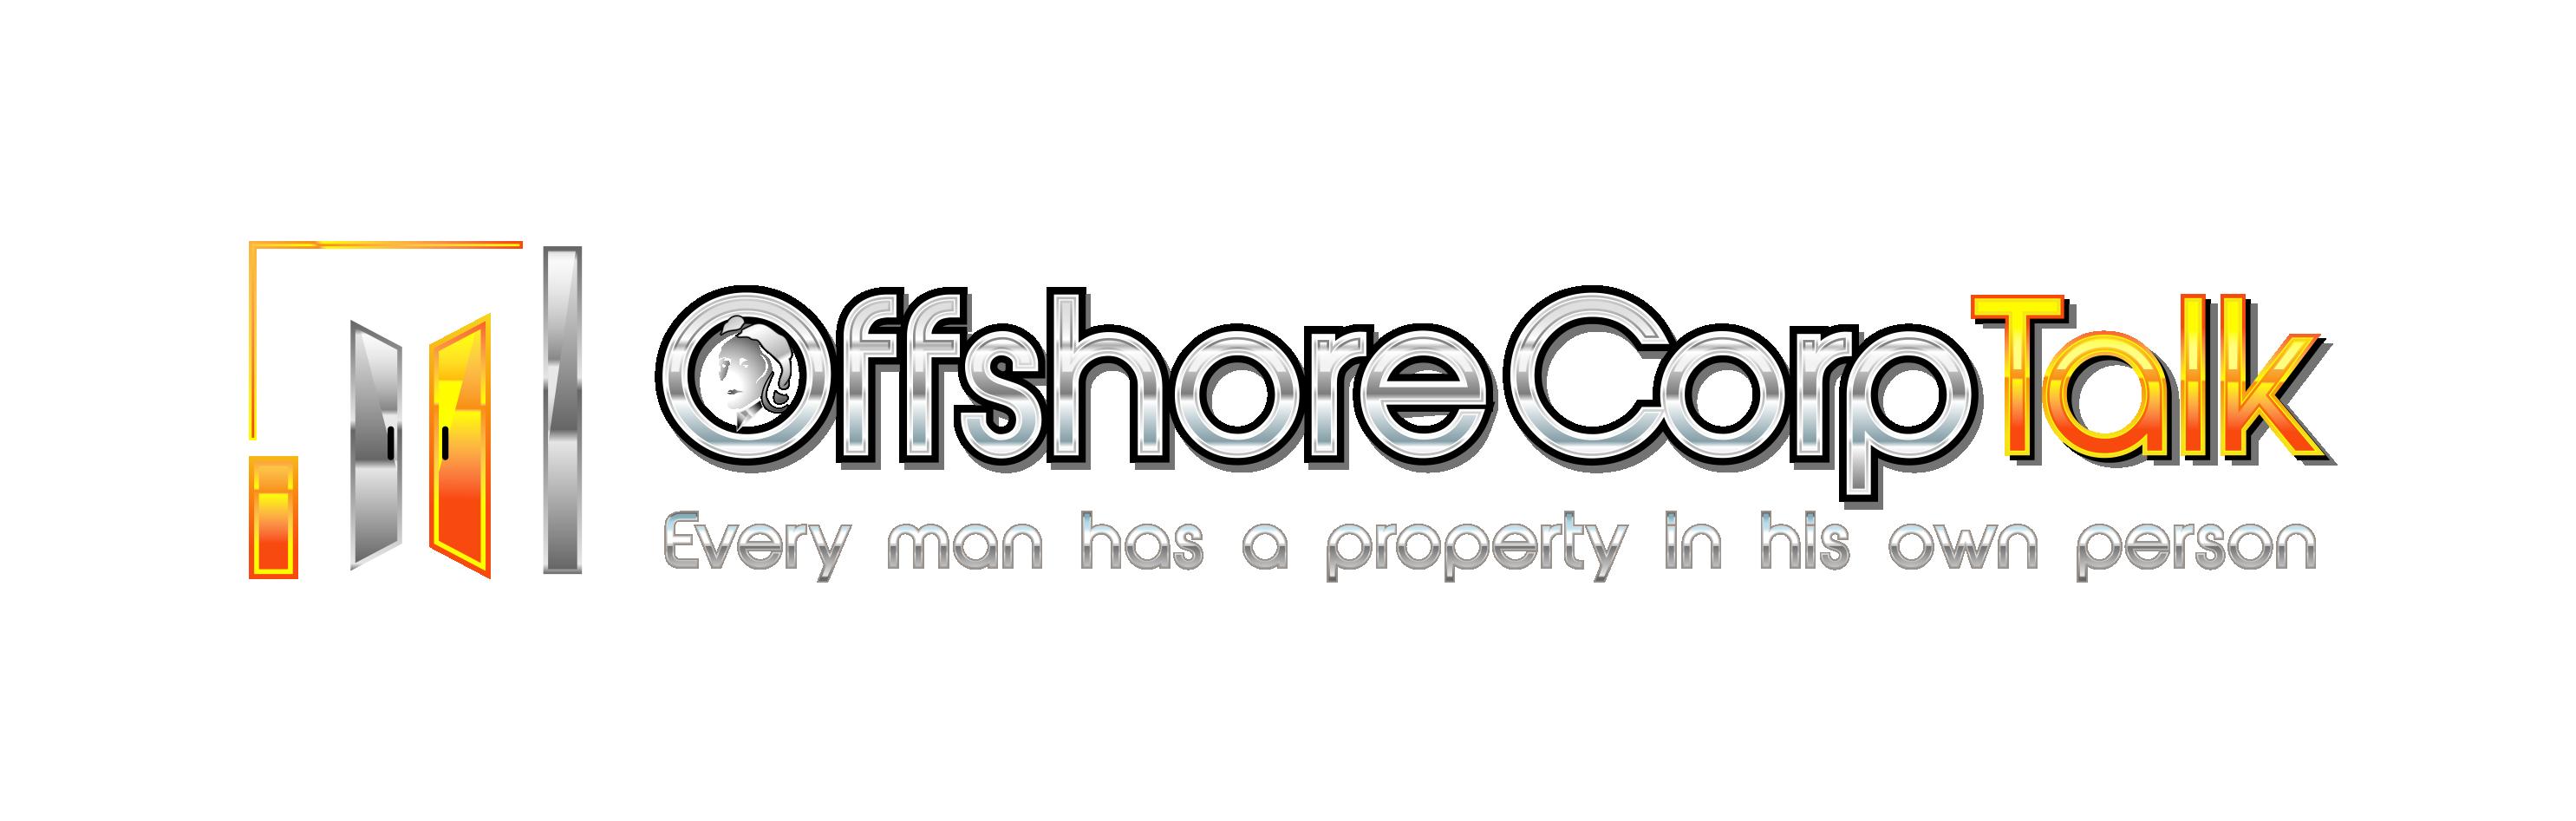 OffshoreCorpTalk.com